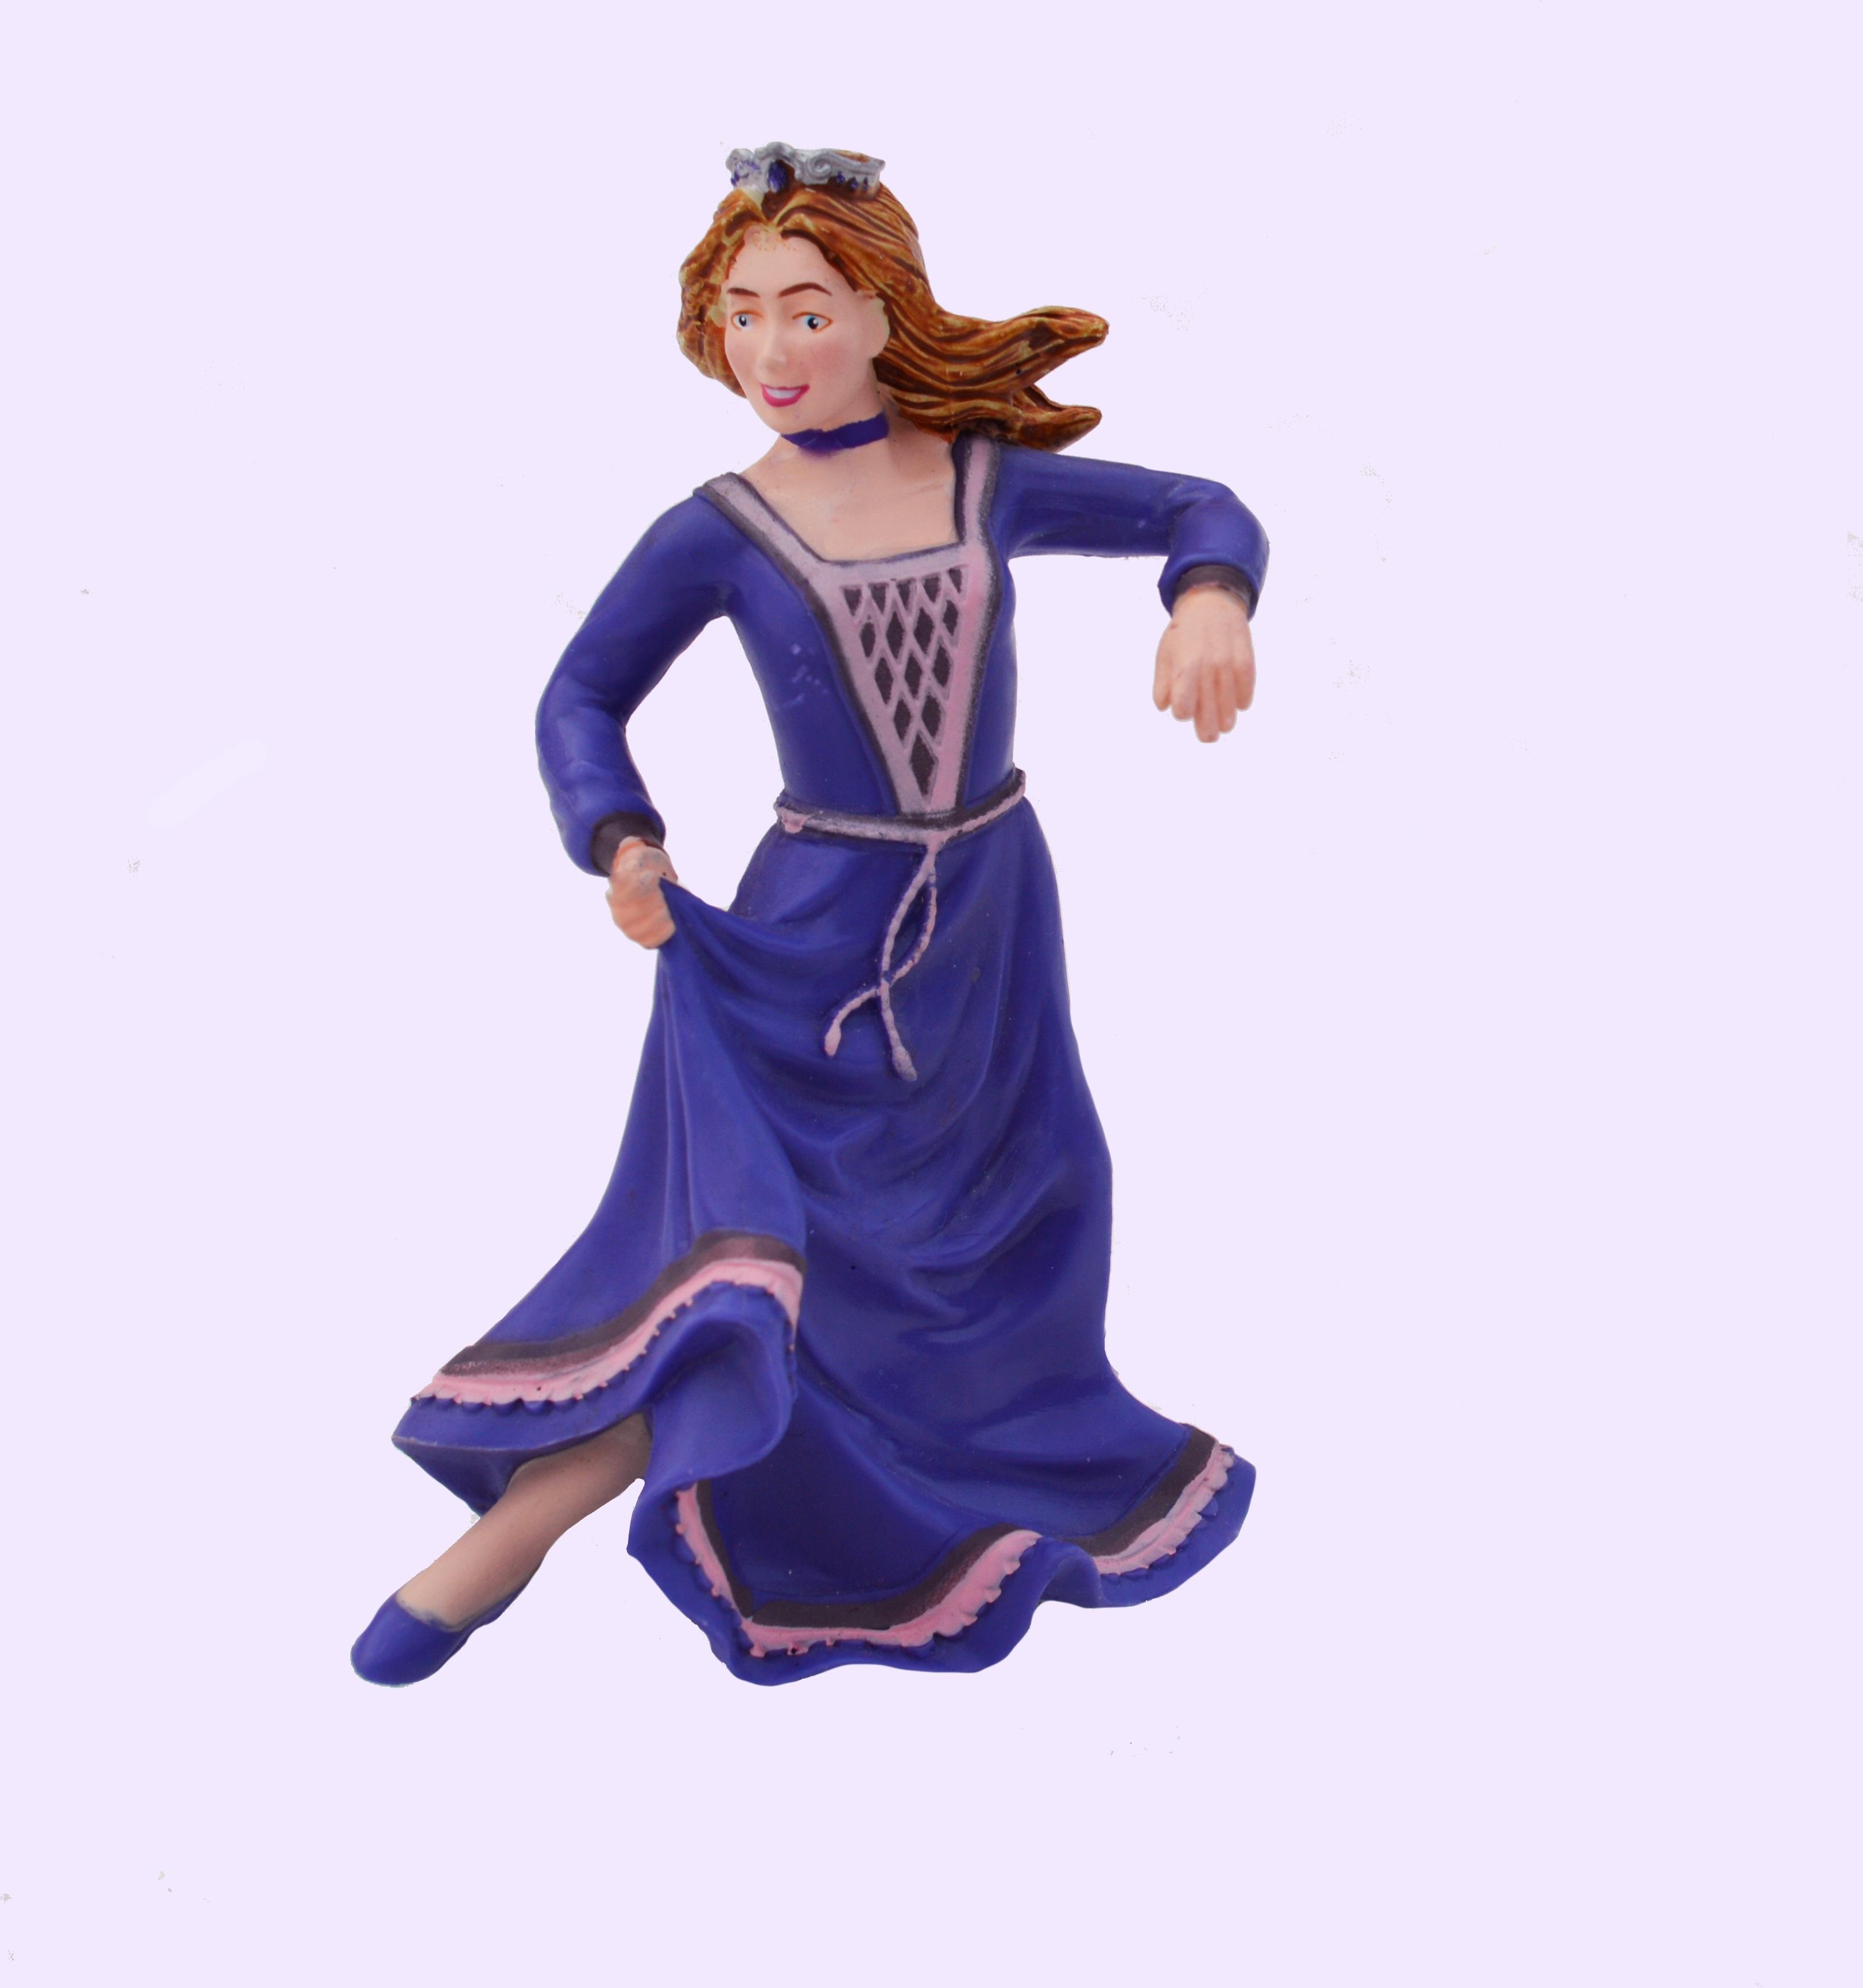 a13f72b93 Free Images   dancing